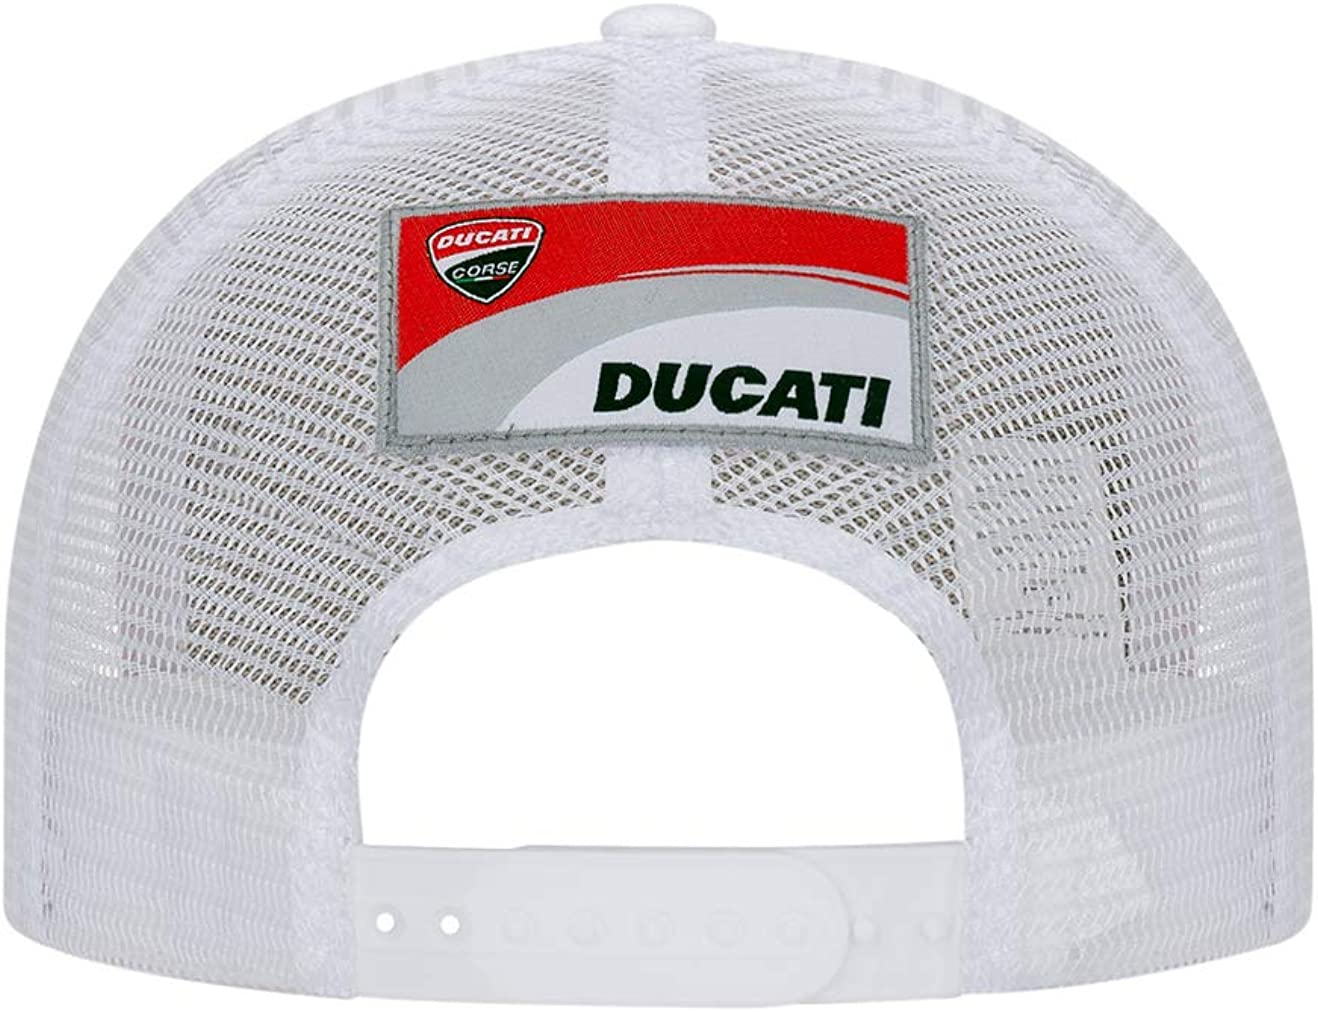 Ducati Corse Flat Marlboro Cap Red